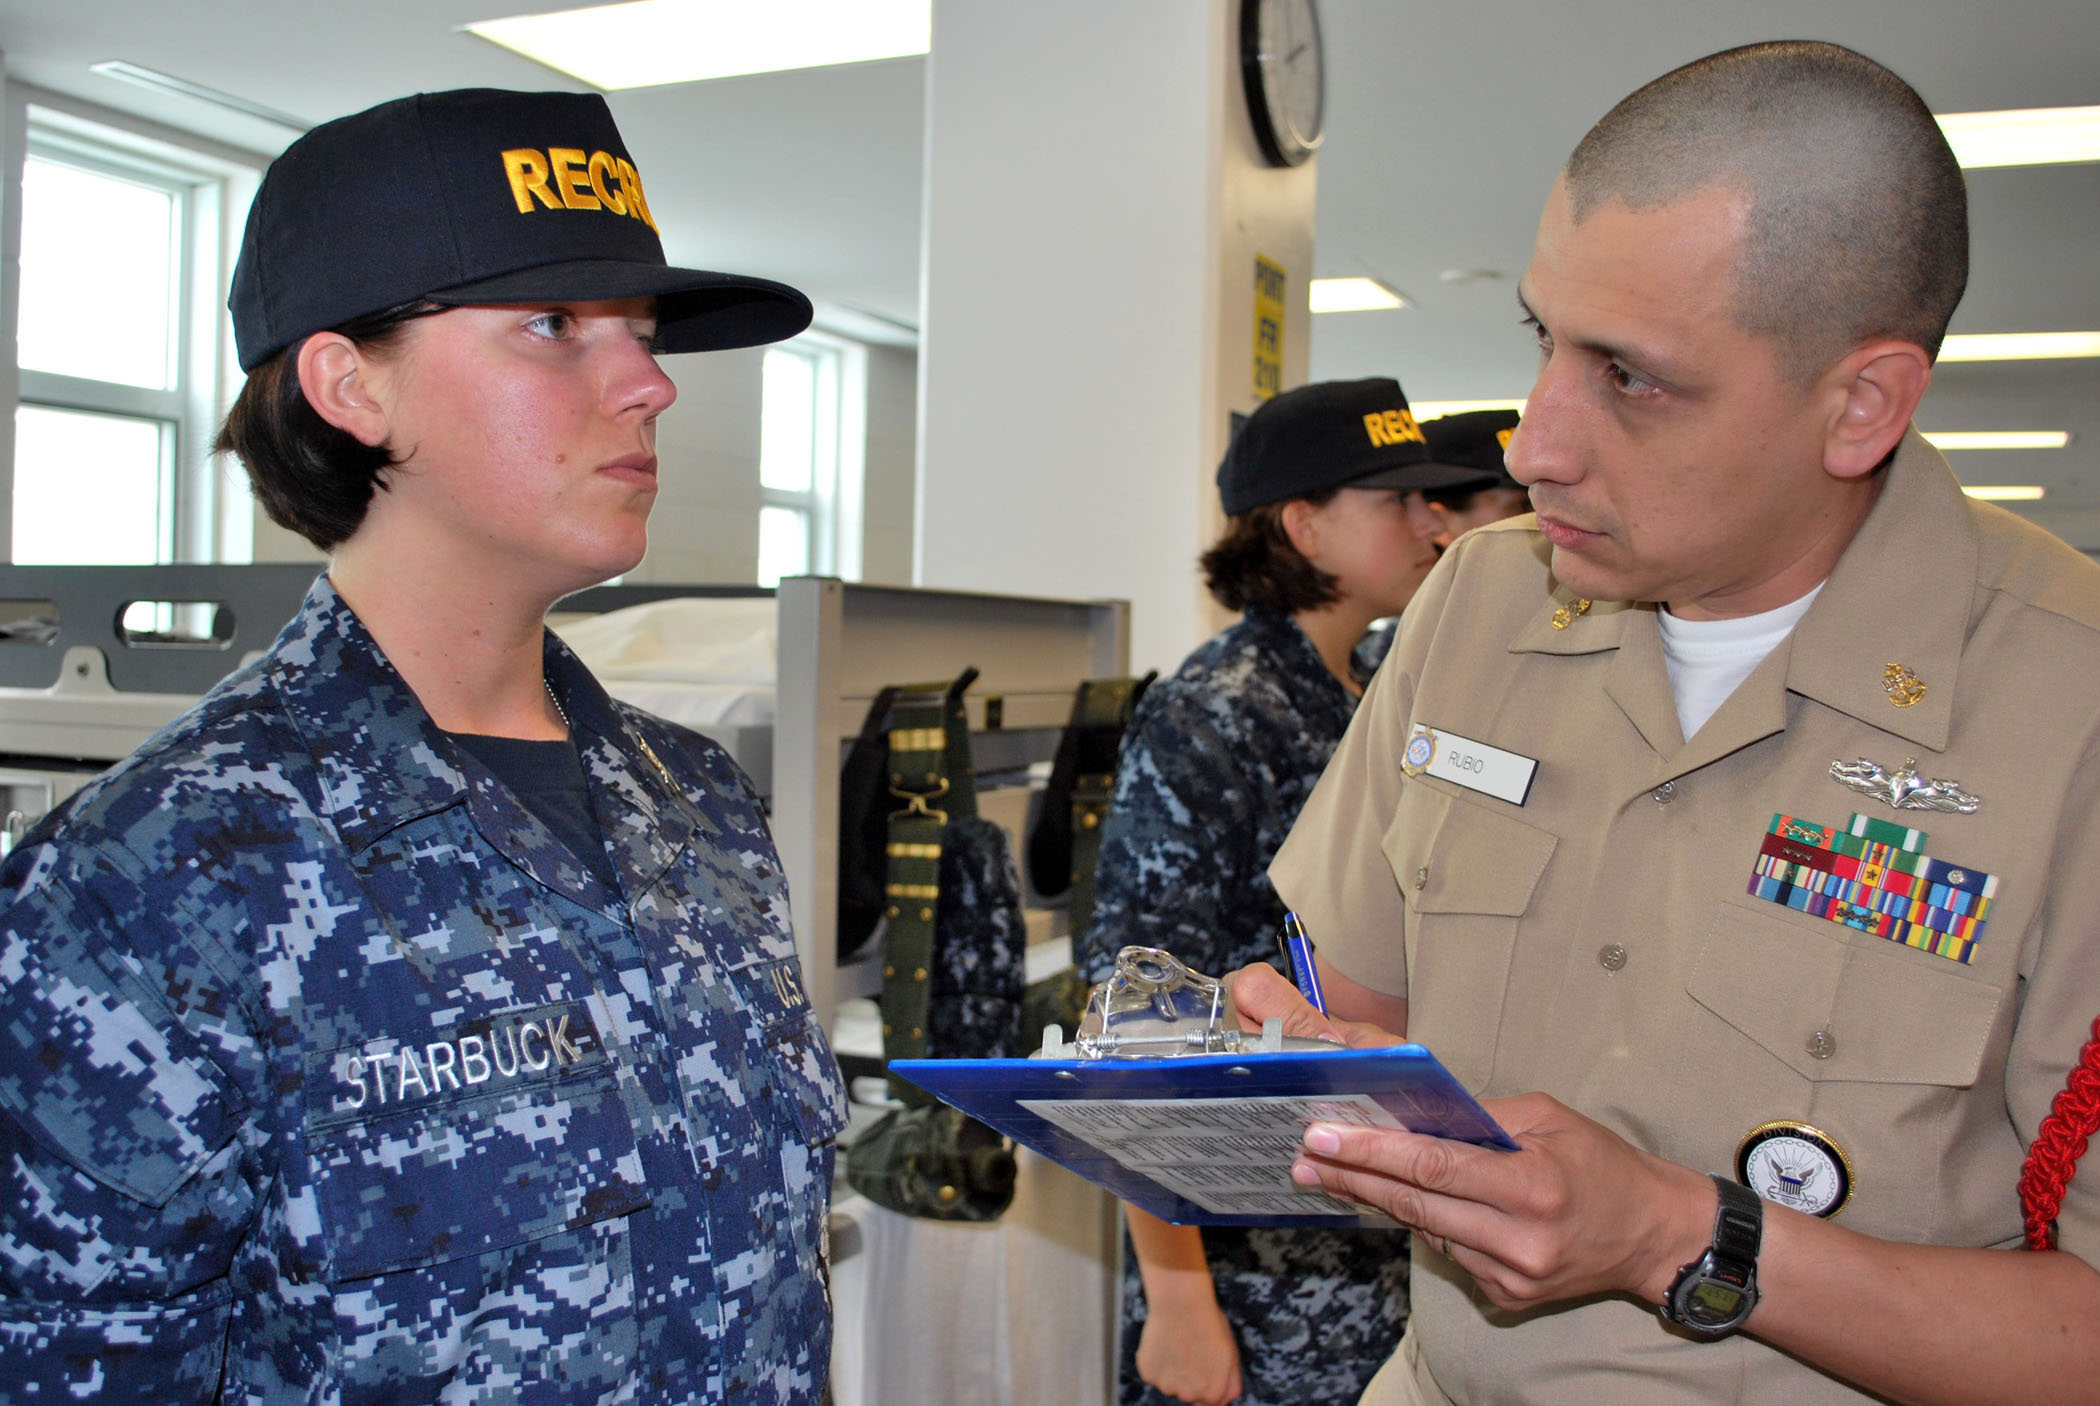 Navy Seaman Uniforms